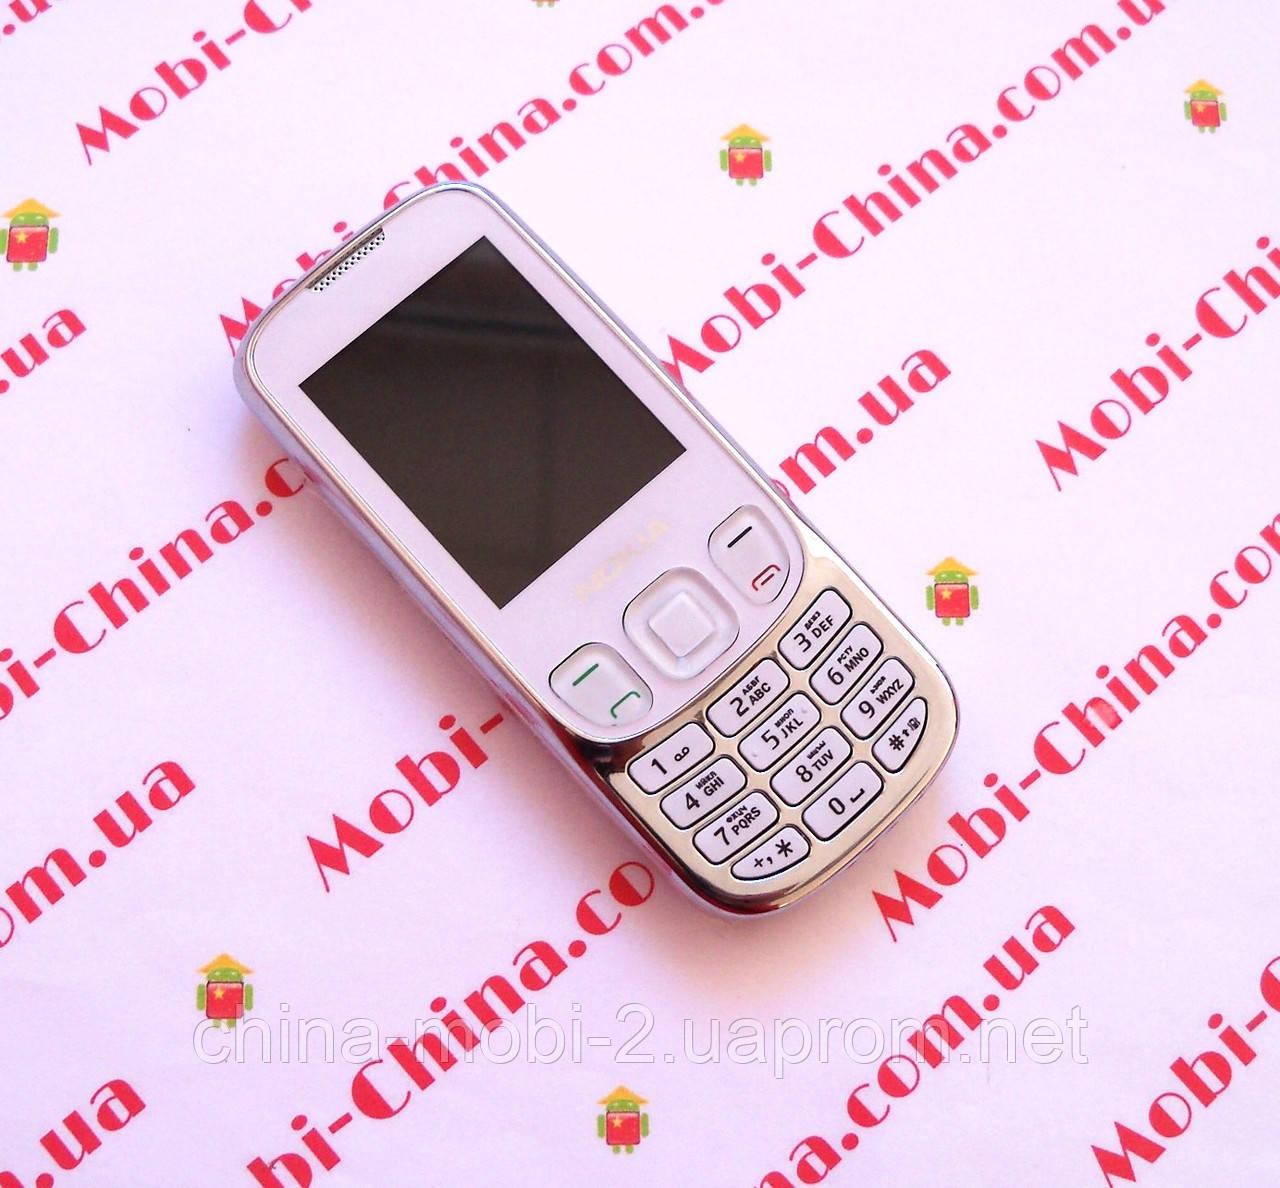 Копия Nokia 6303 на 3 сим-карты (nokia S6+) new